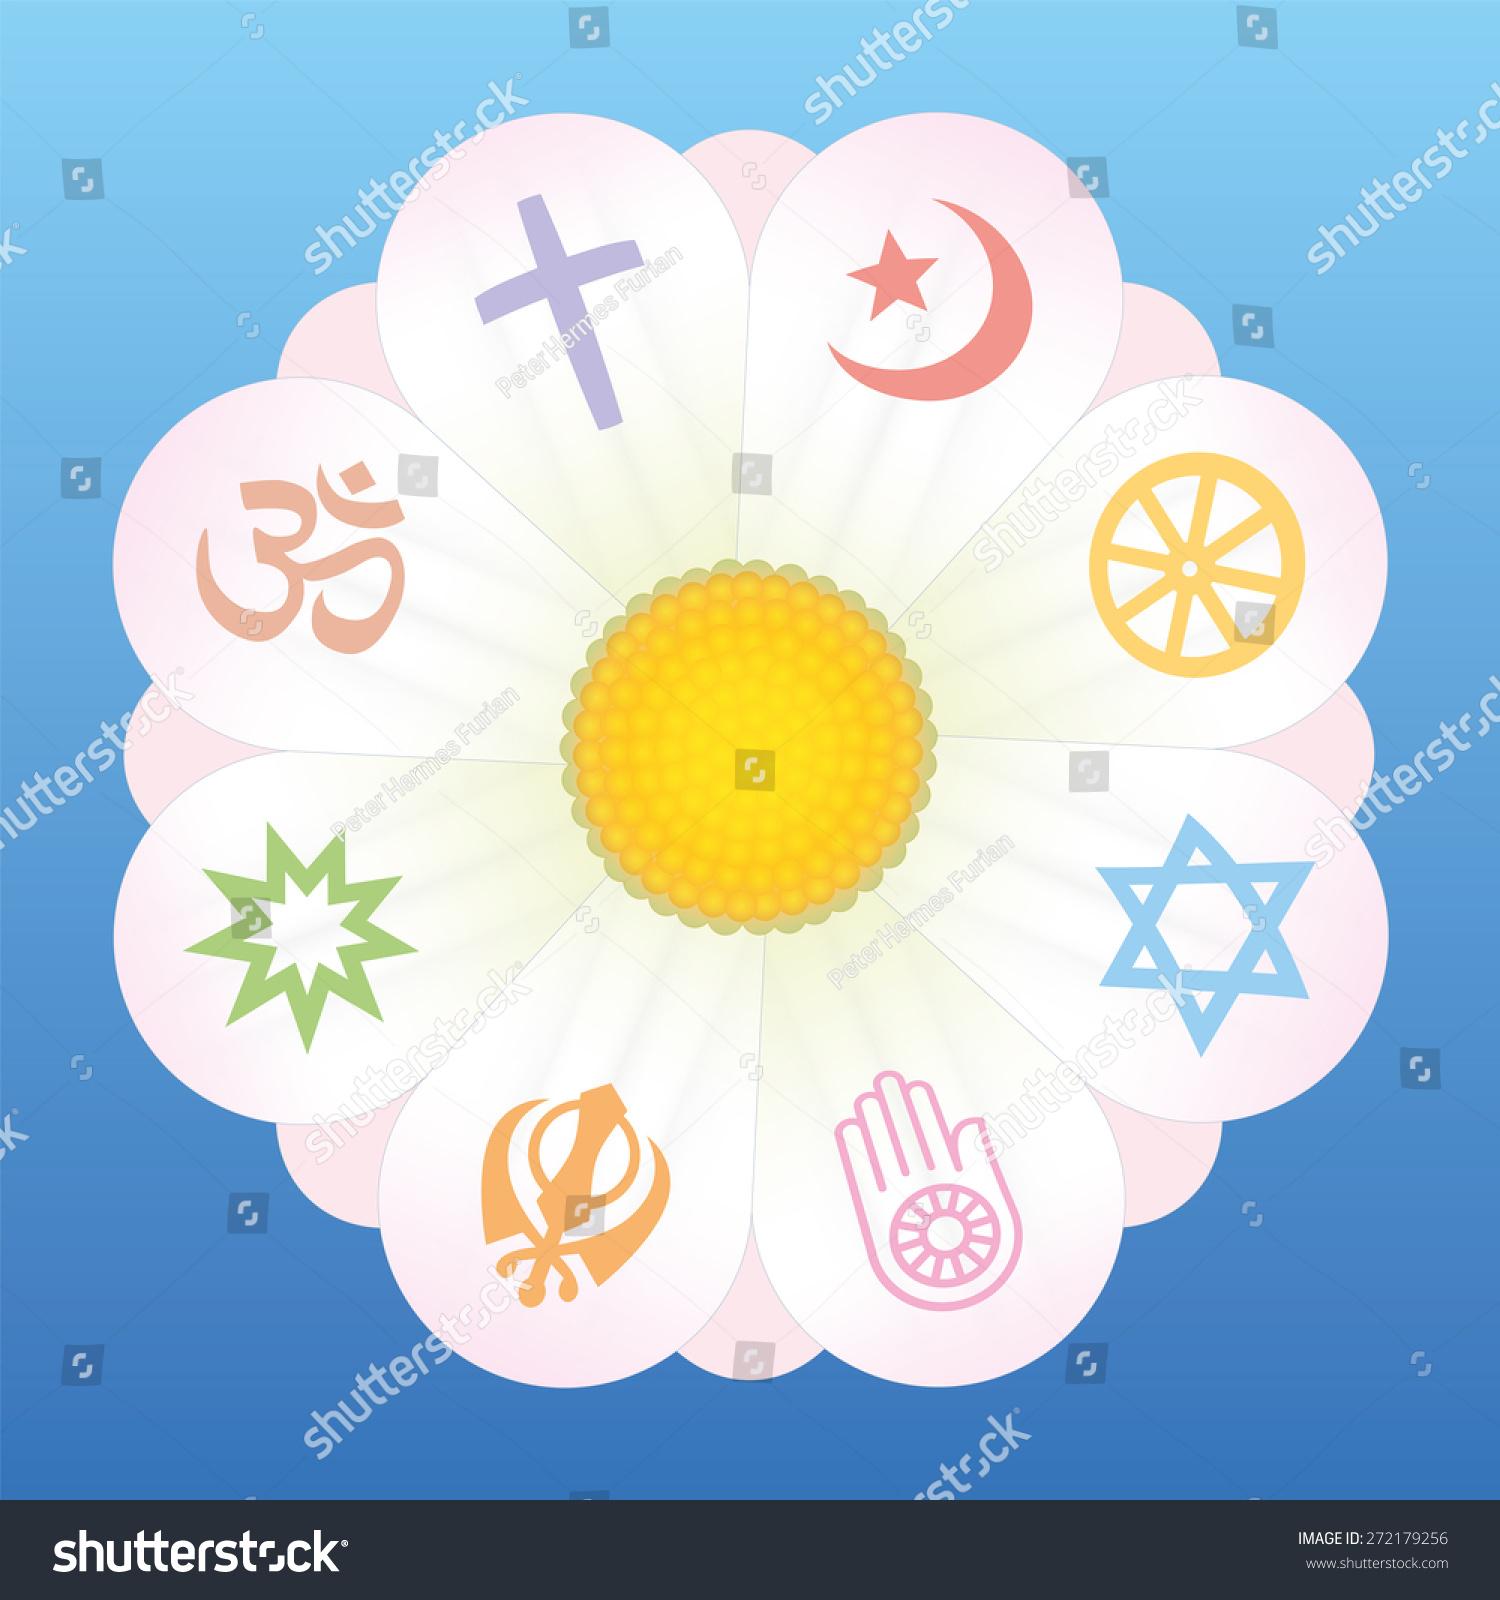 World Religion Symbols On Petals Flower Stock Vector Royalty Free